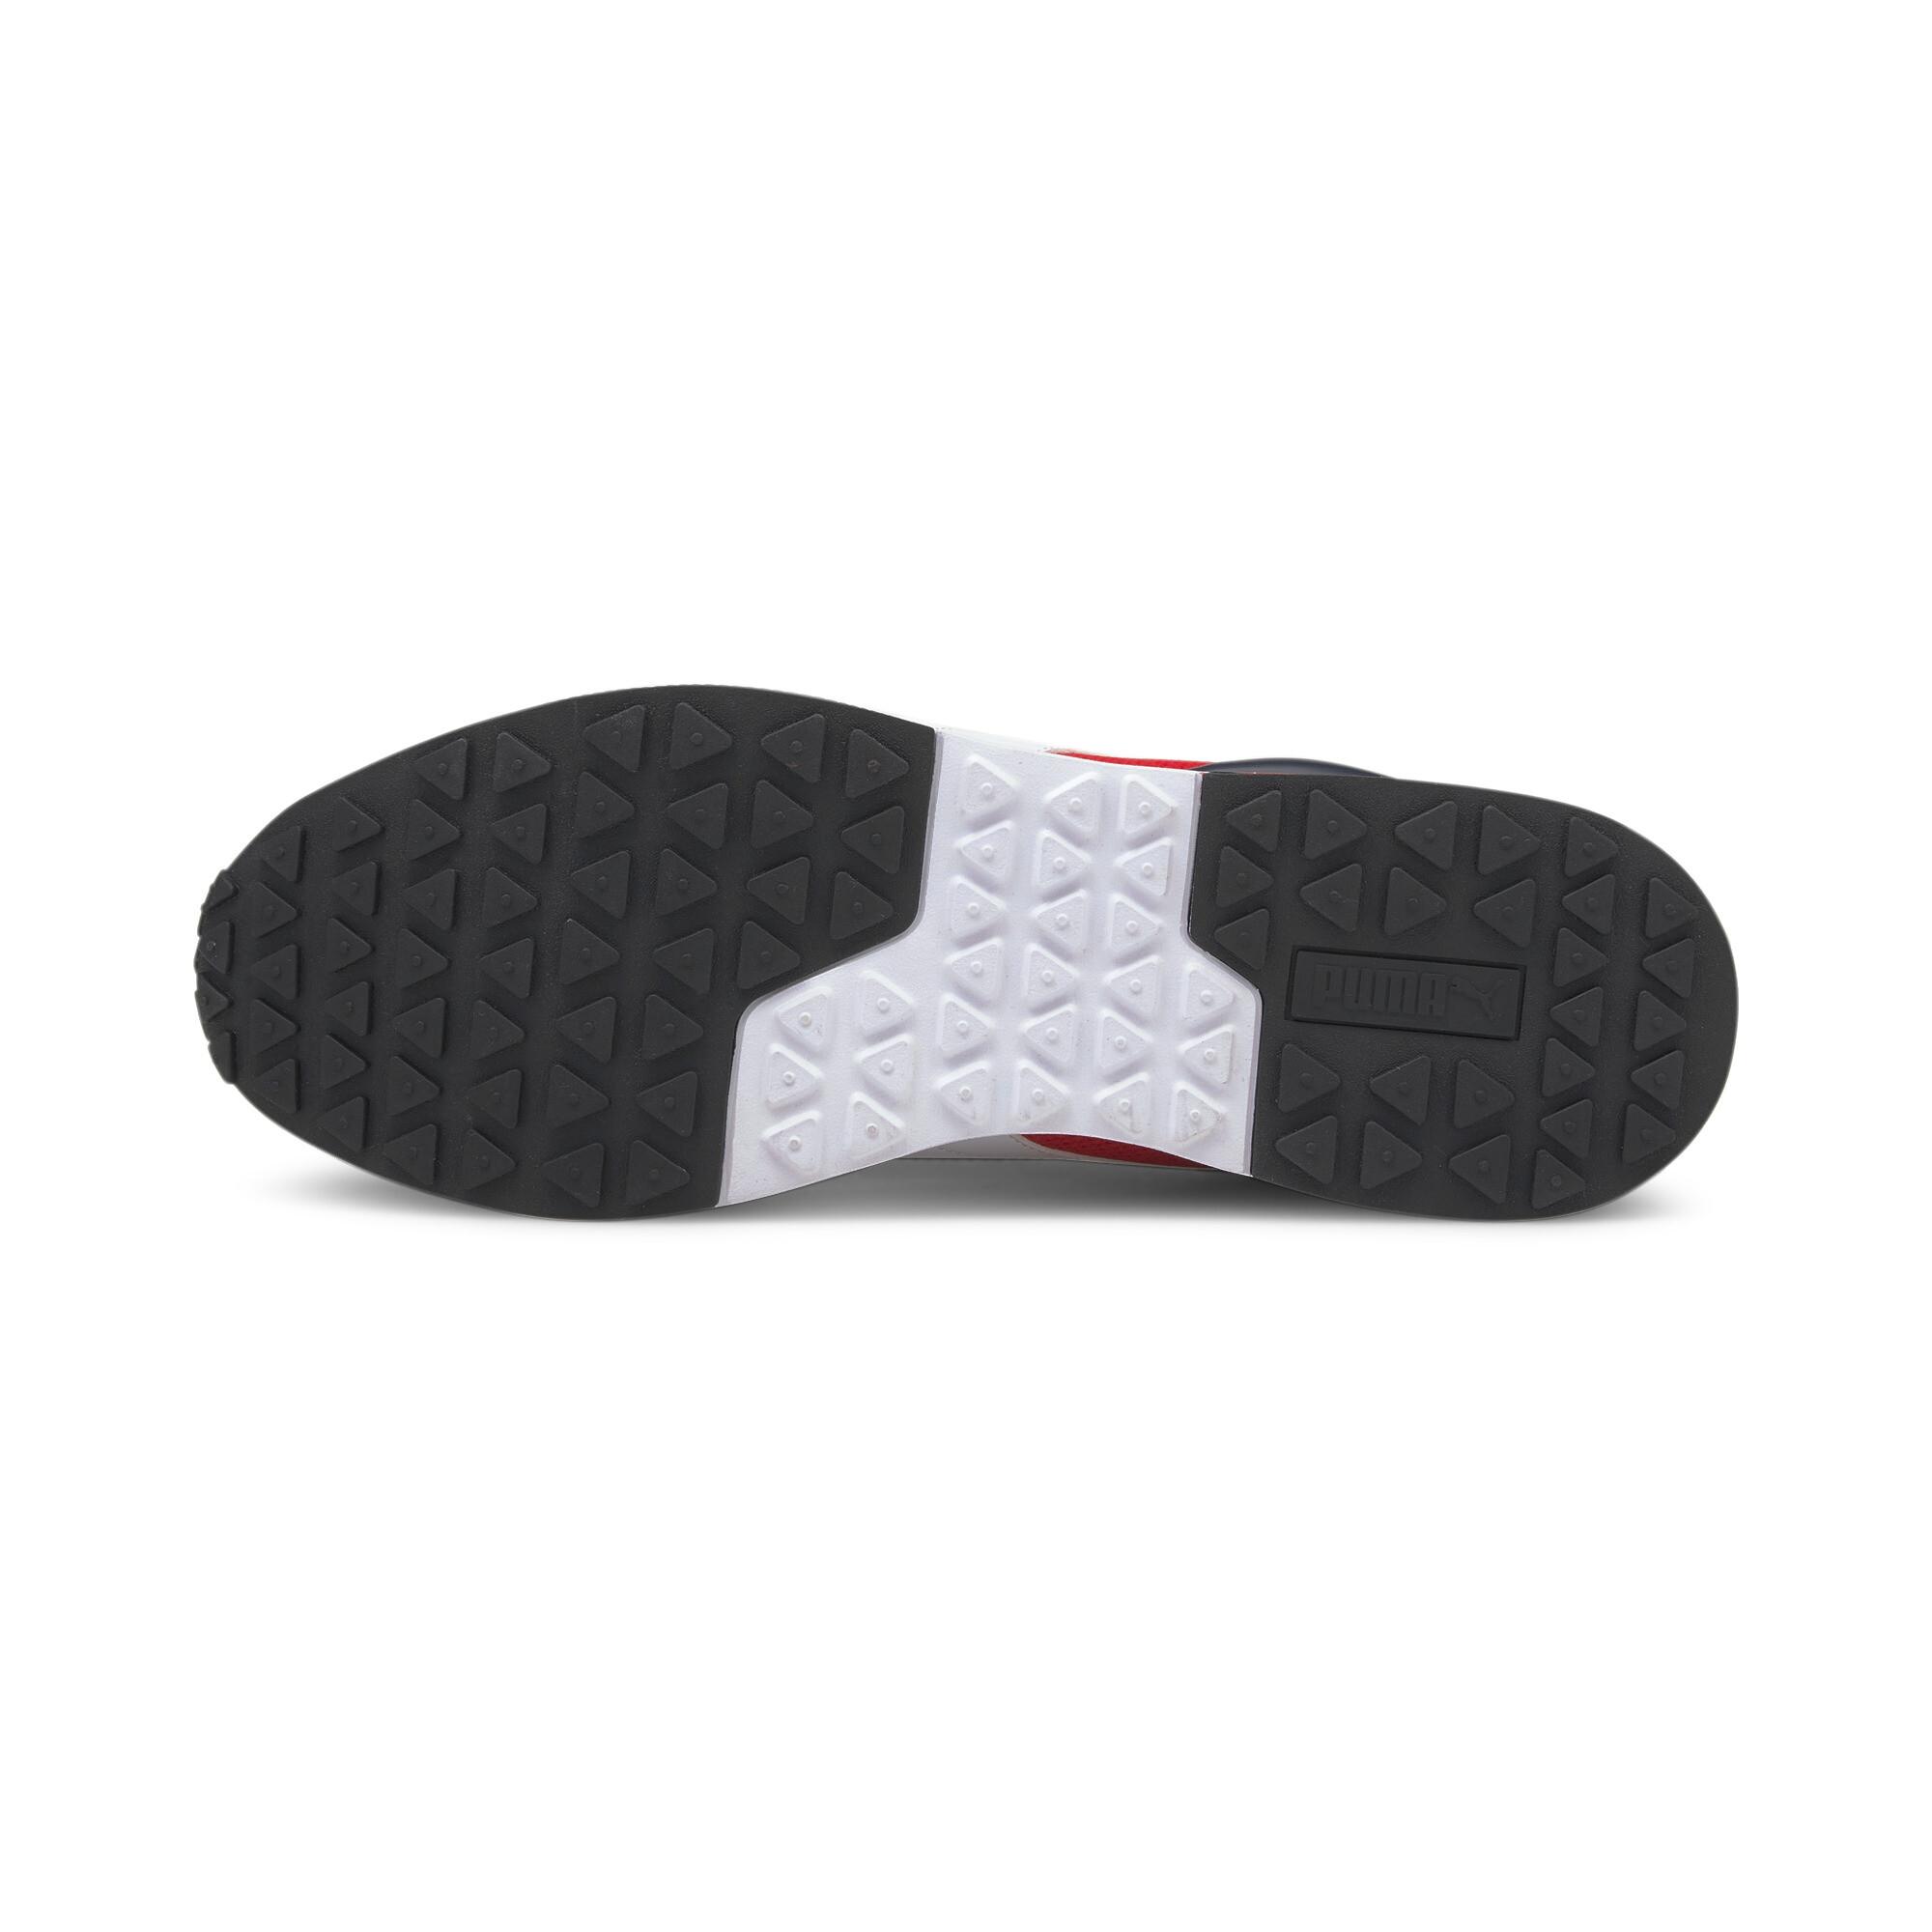 thumbnail 8 - PUMA Men's R78 FUTR Sneakers